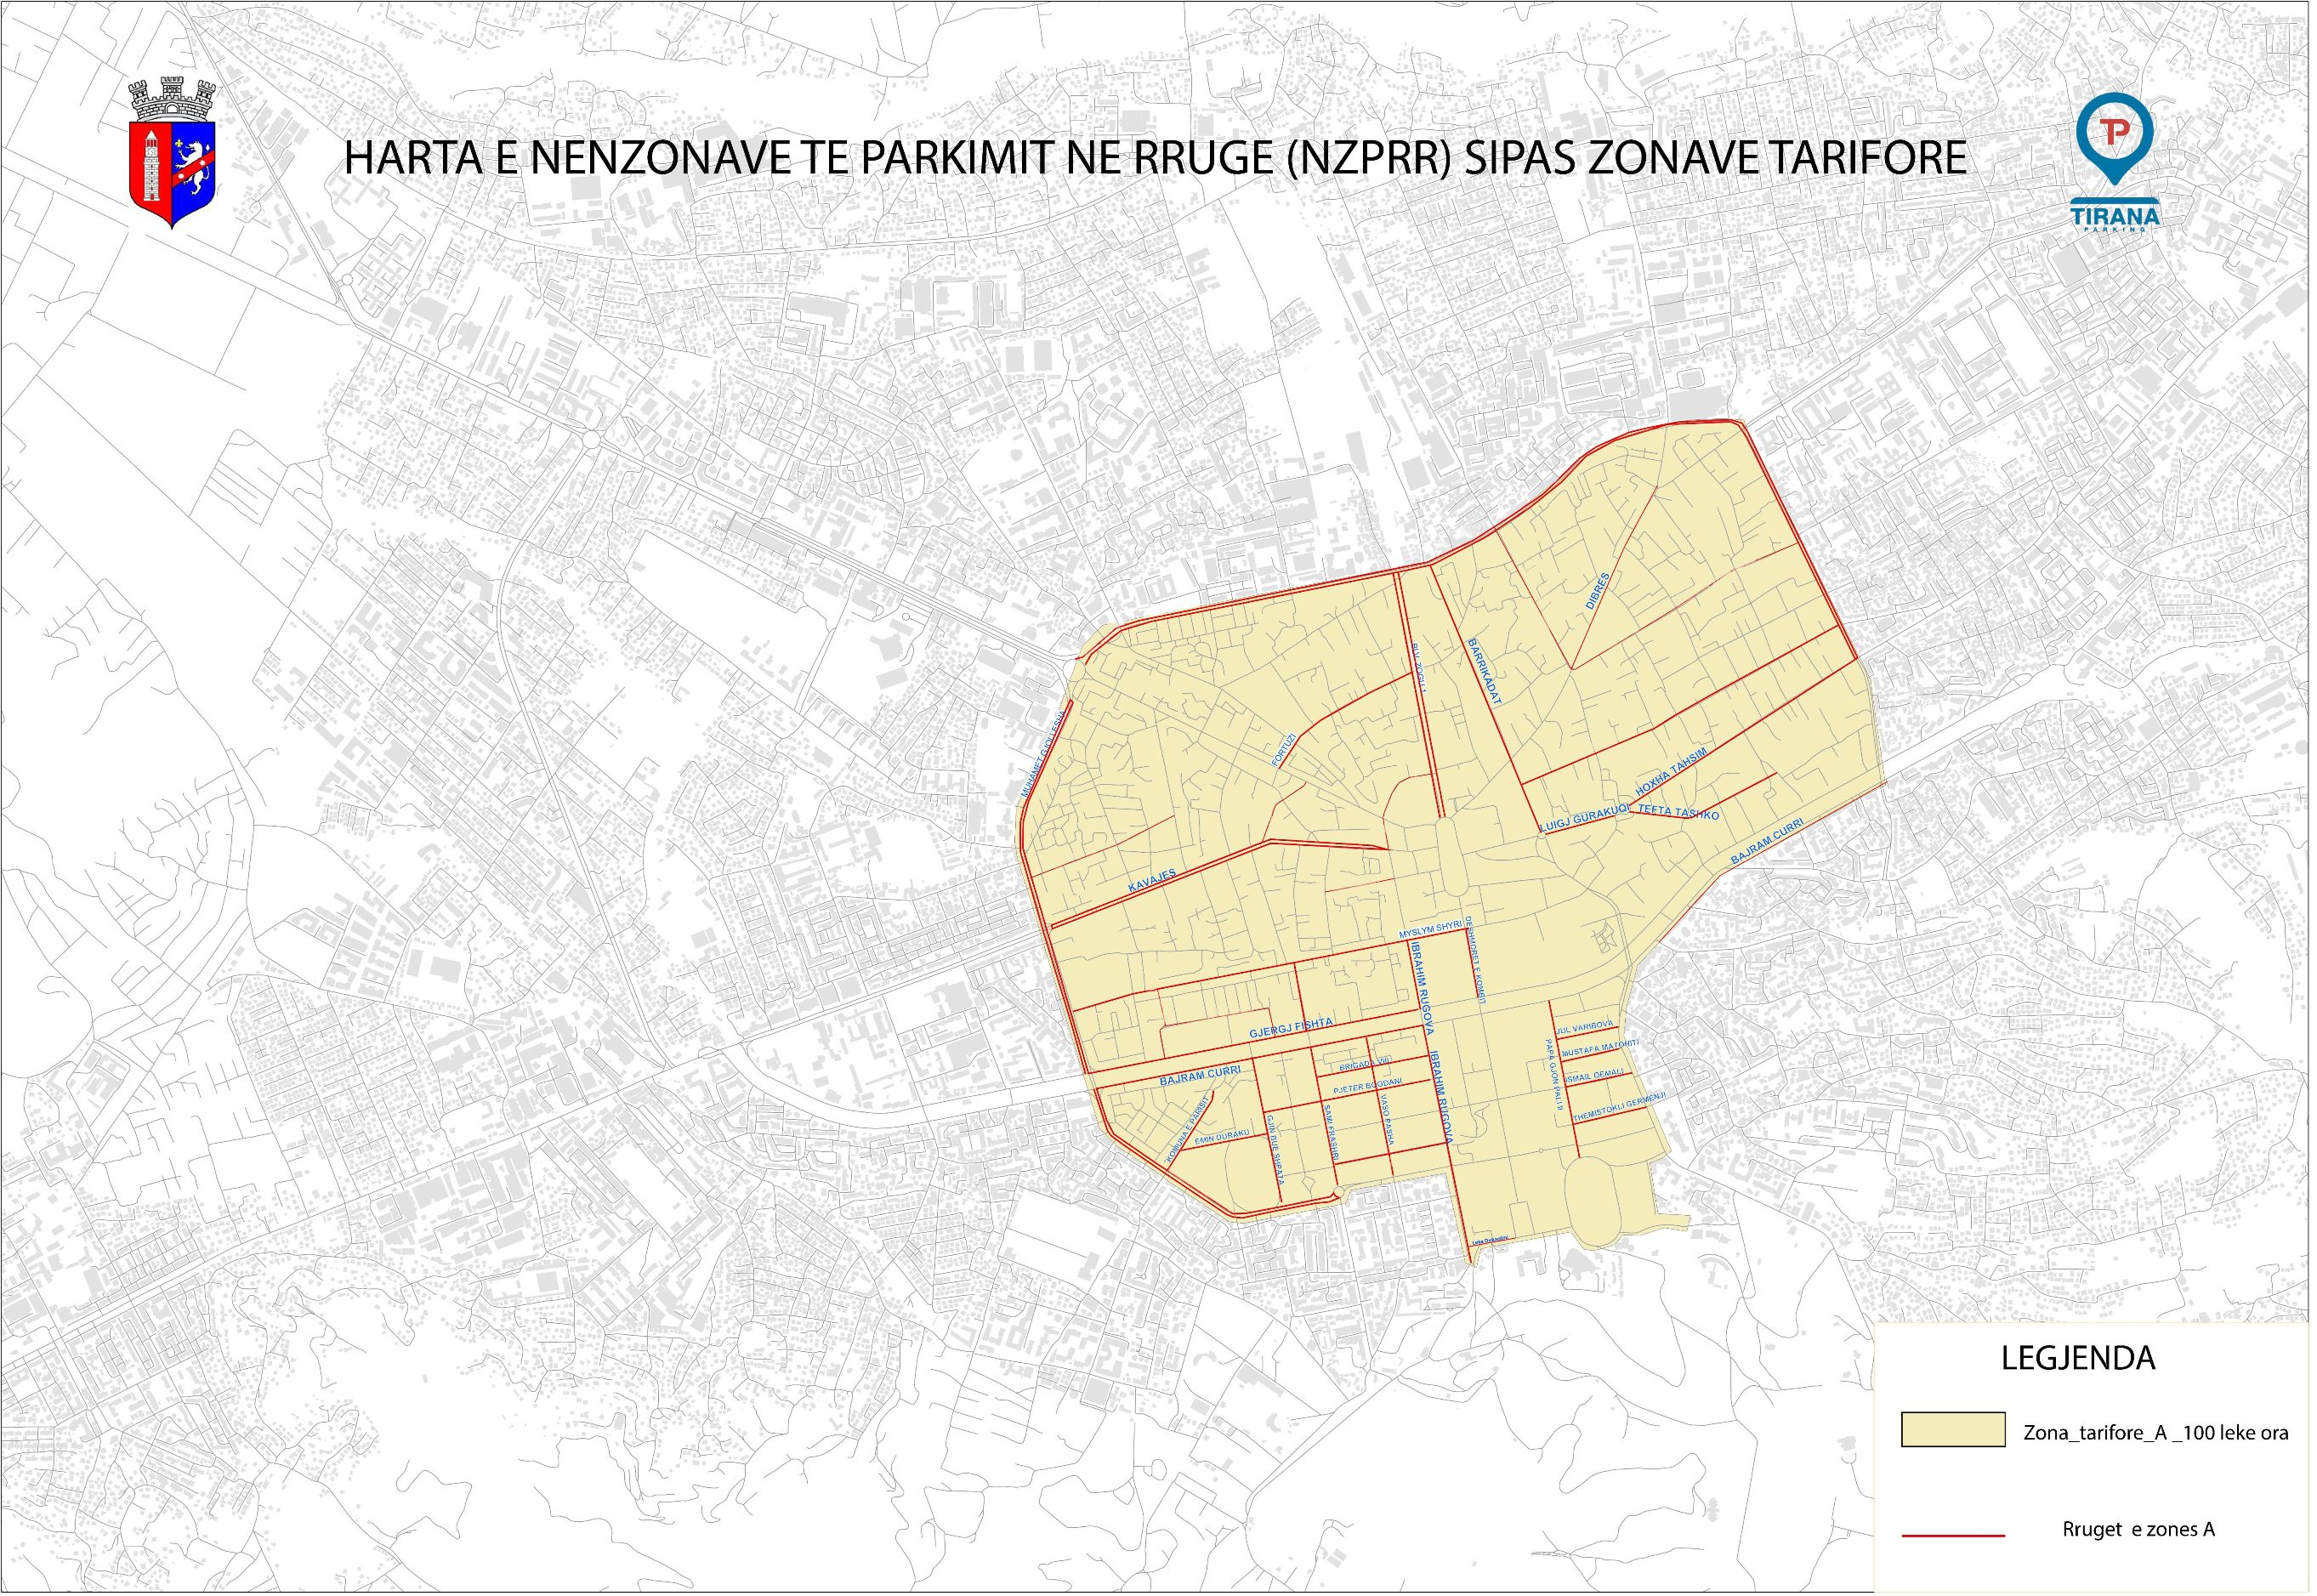 Harta zona tarifore A